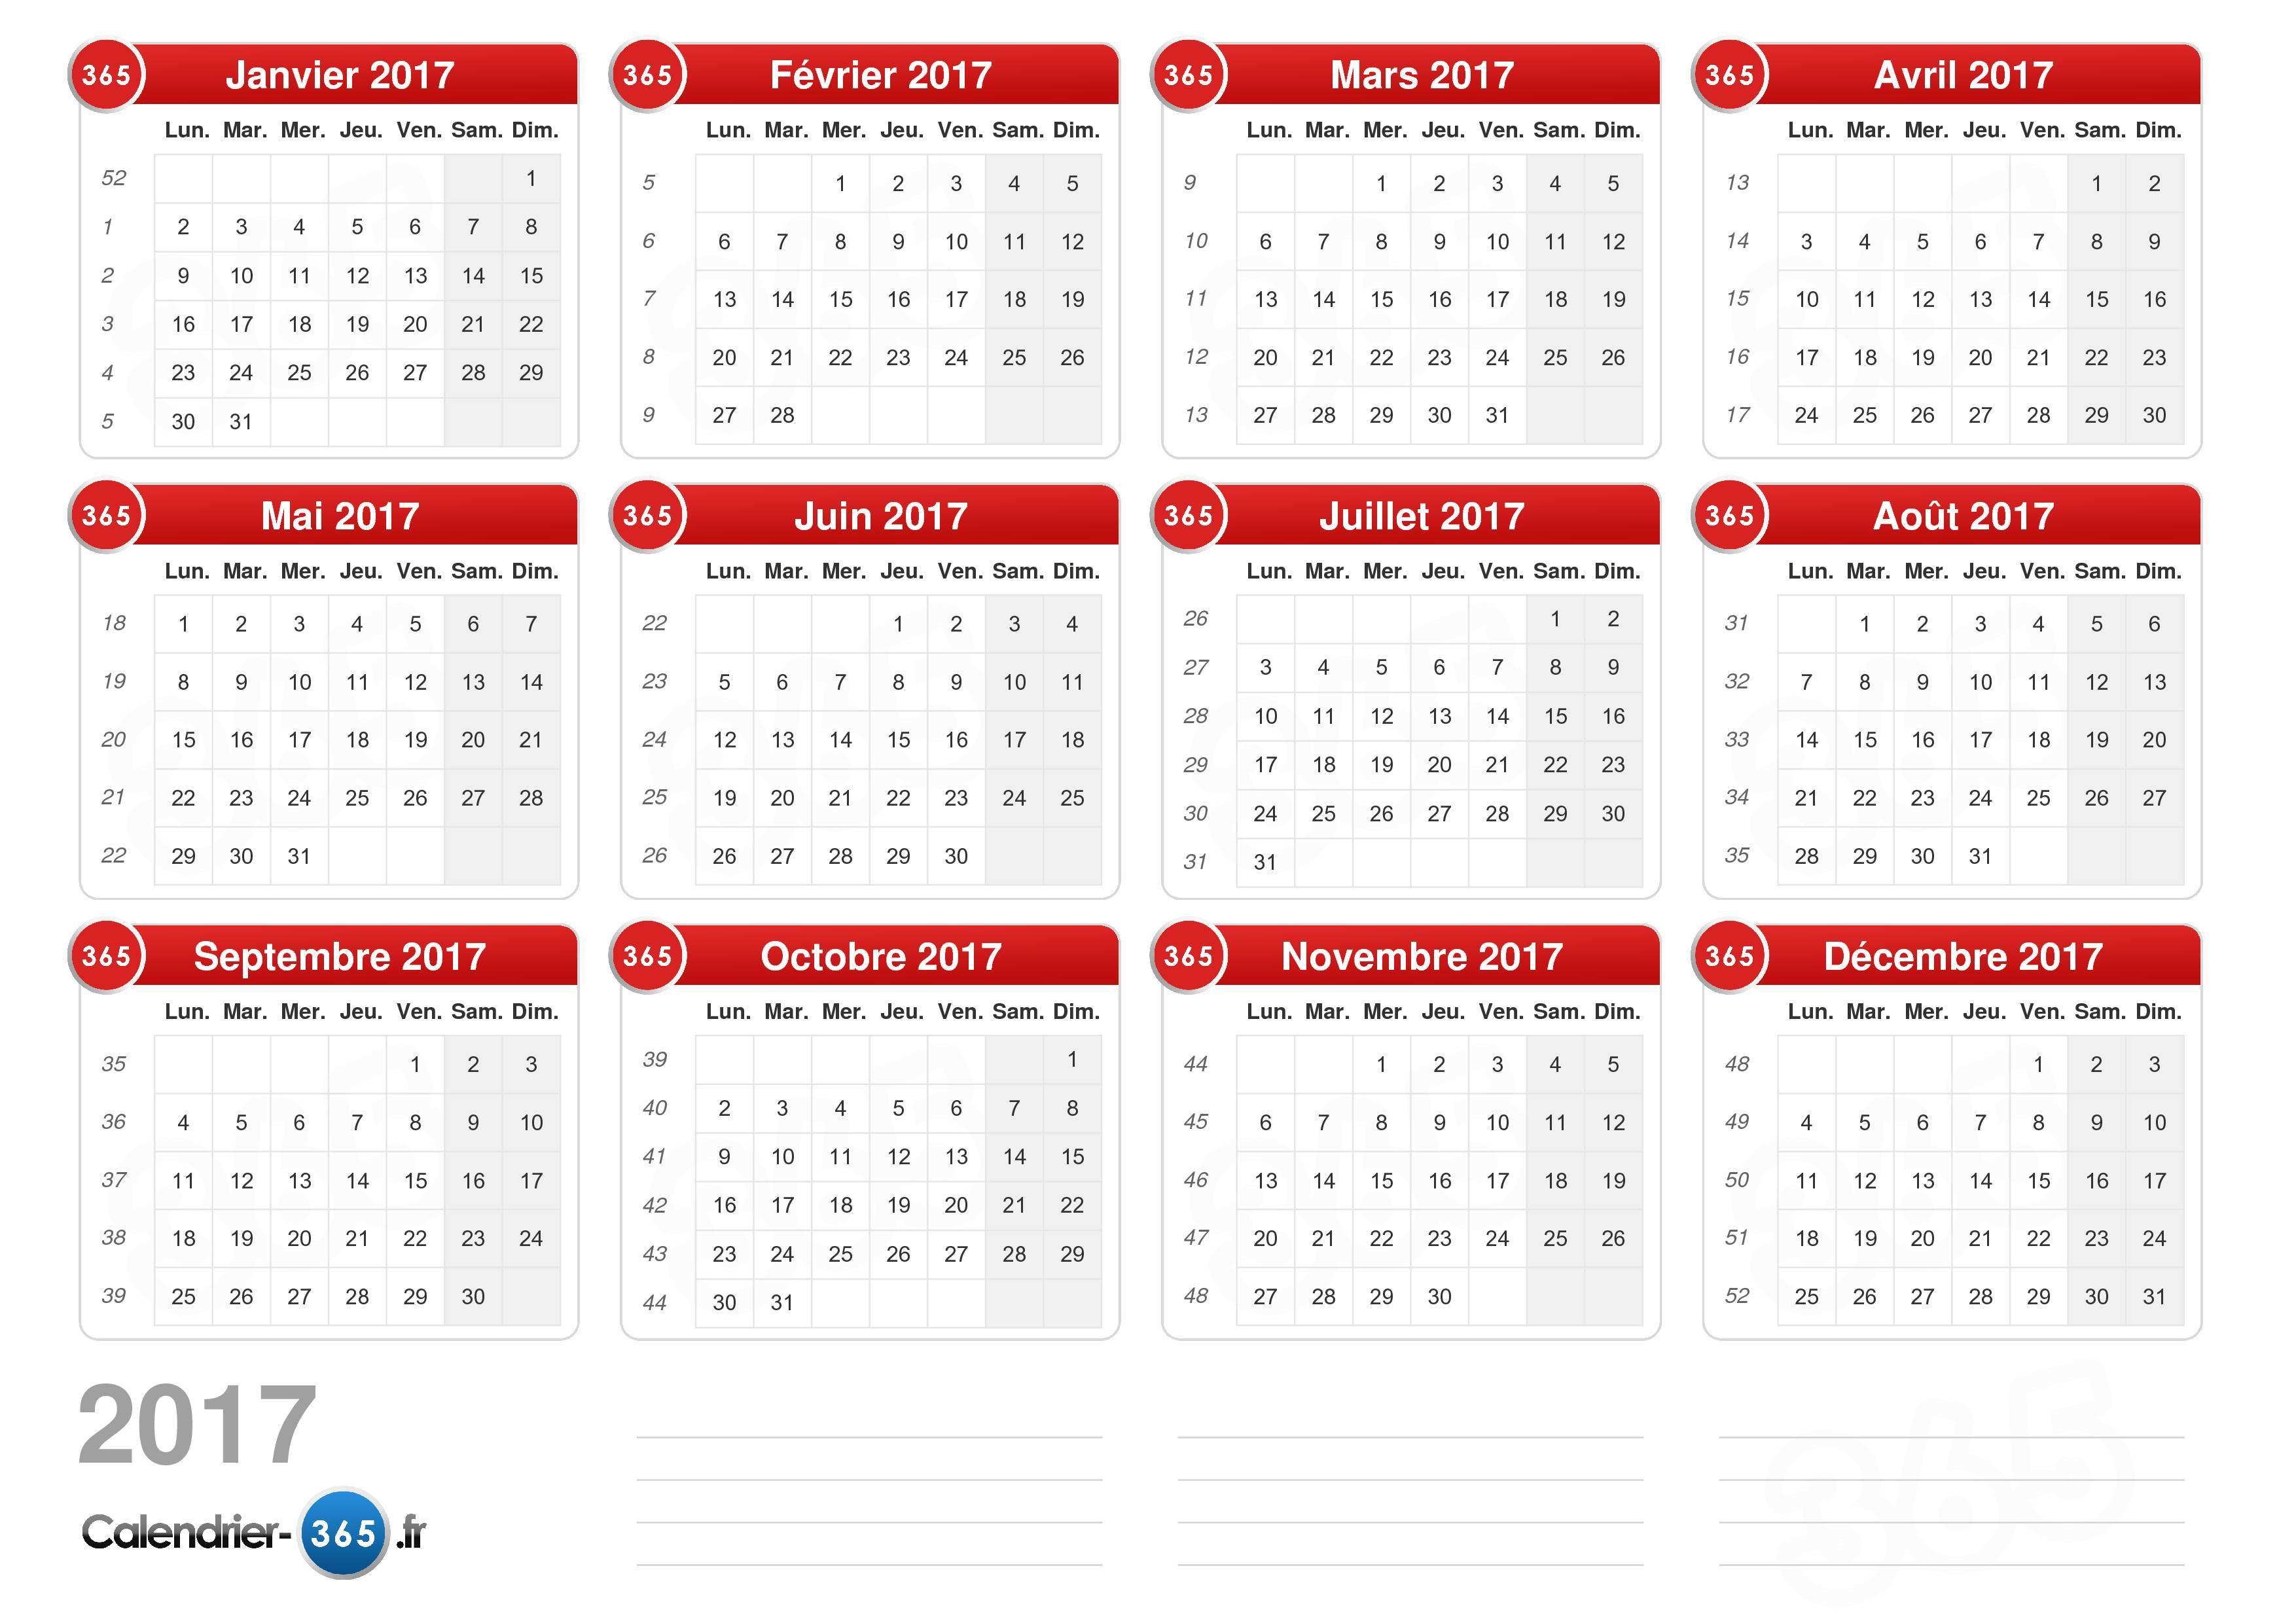 Calendrier 2017 - Date vacances noel 2017 ...